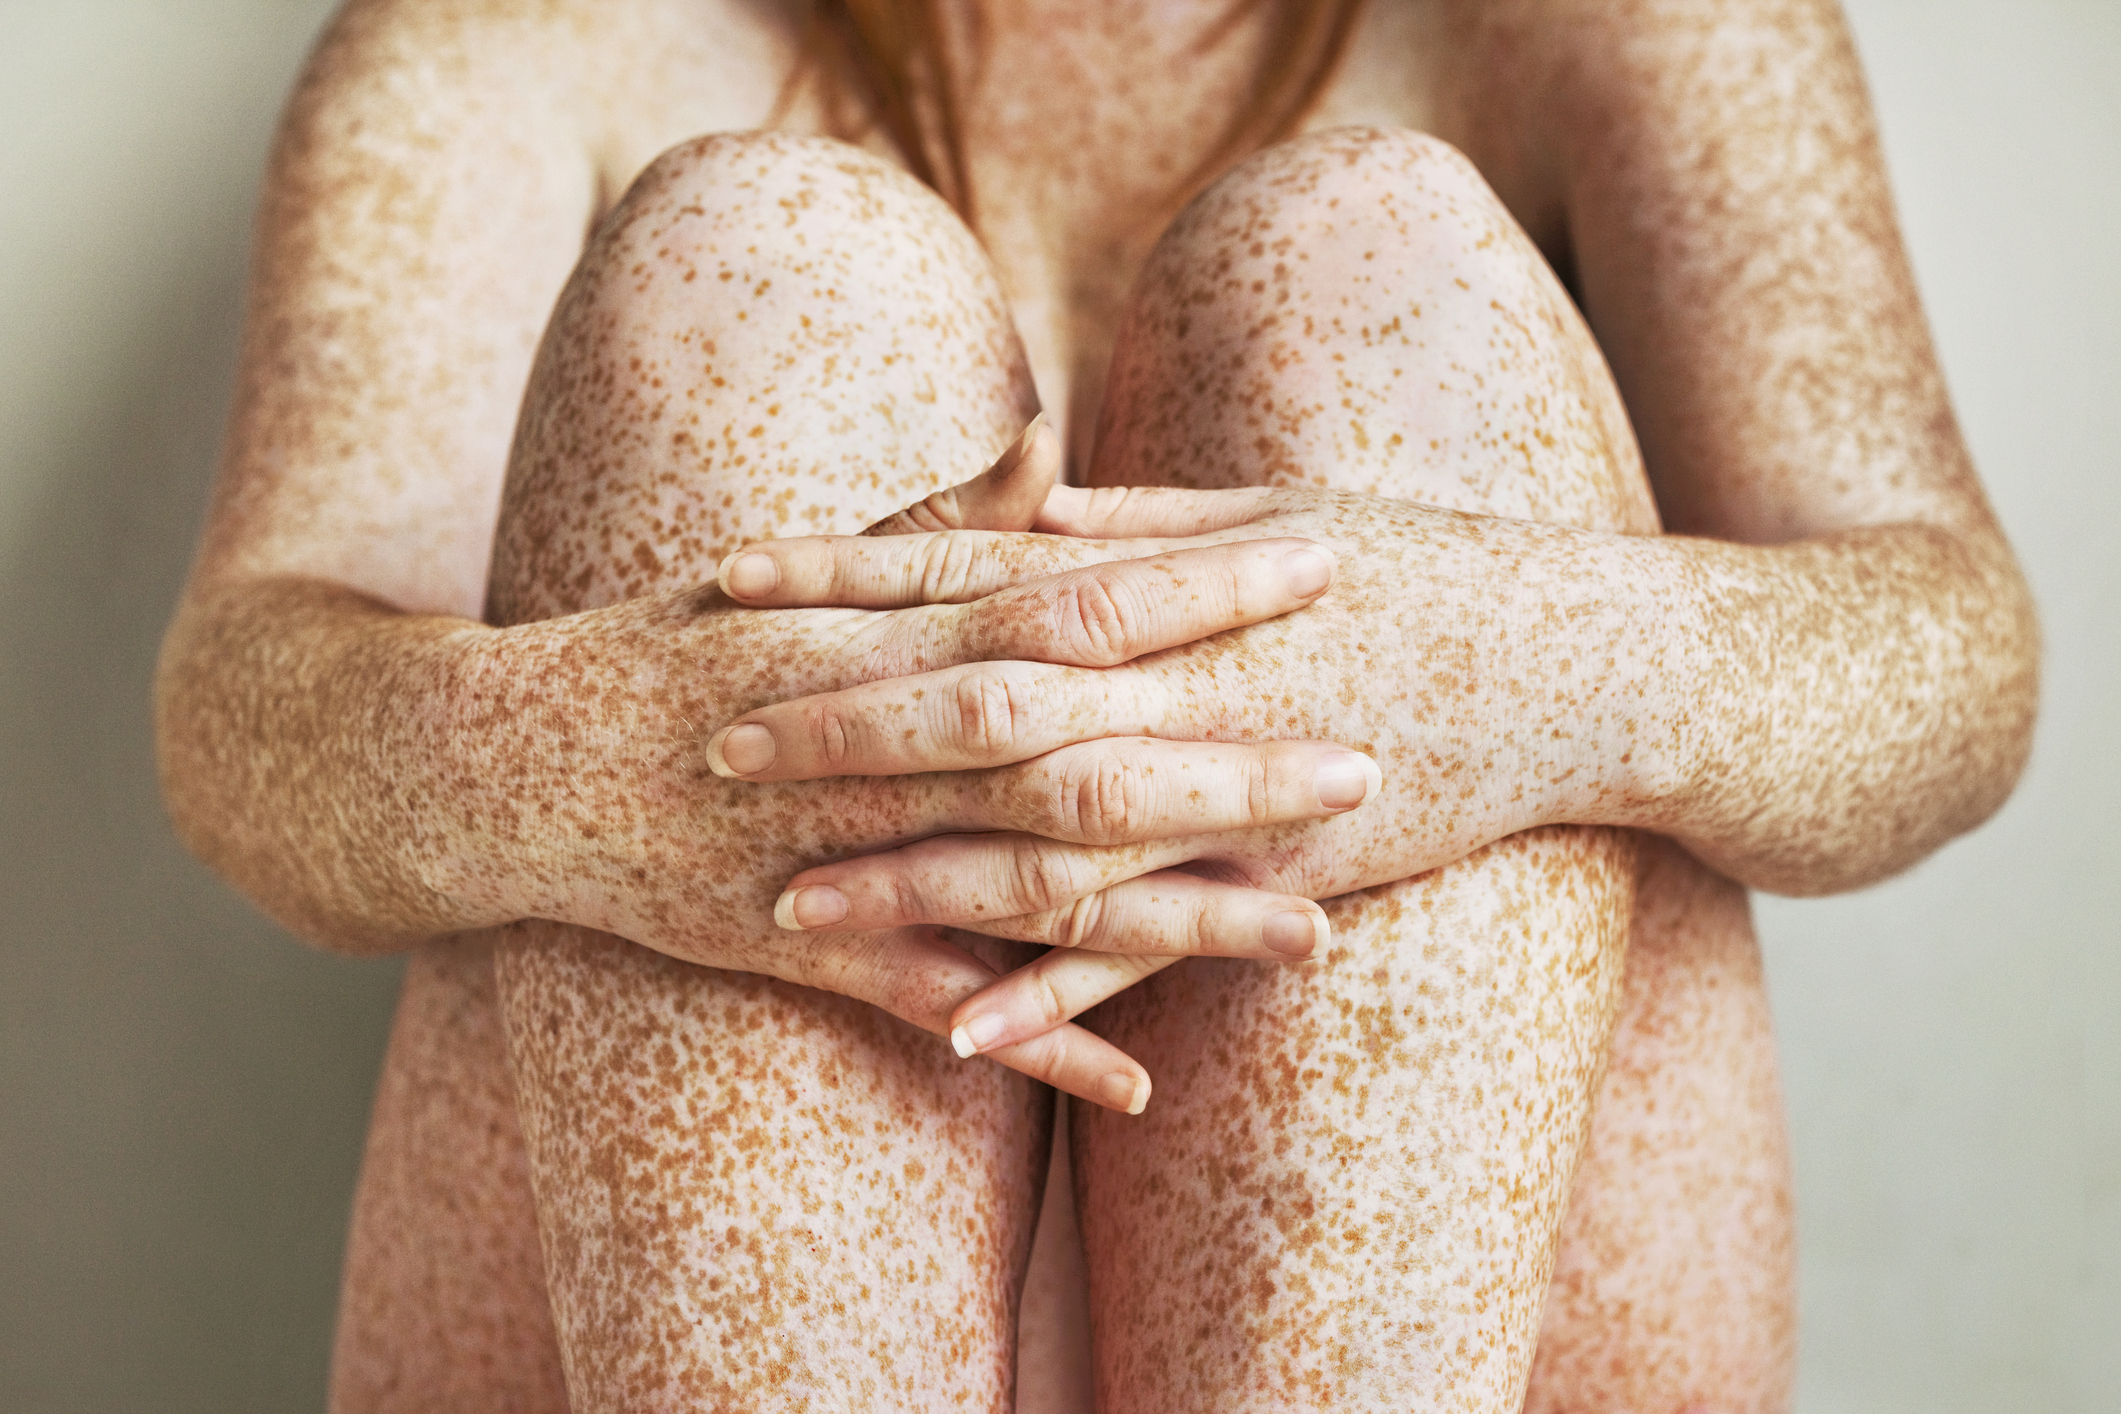 Нарушения пигментации кожи: причины, лечение, фото